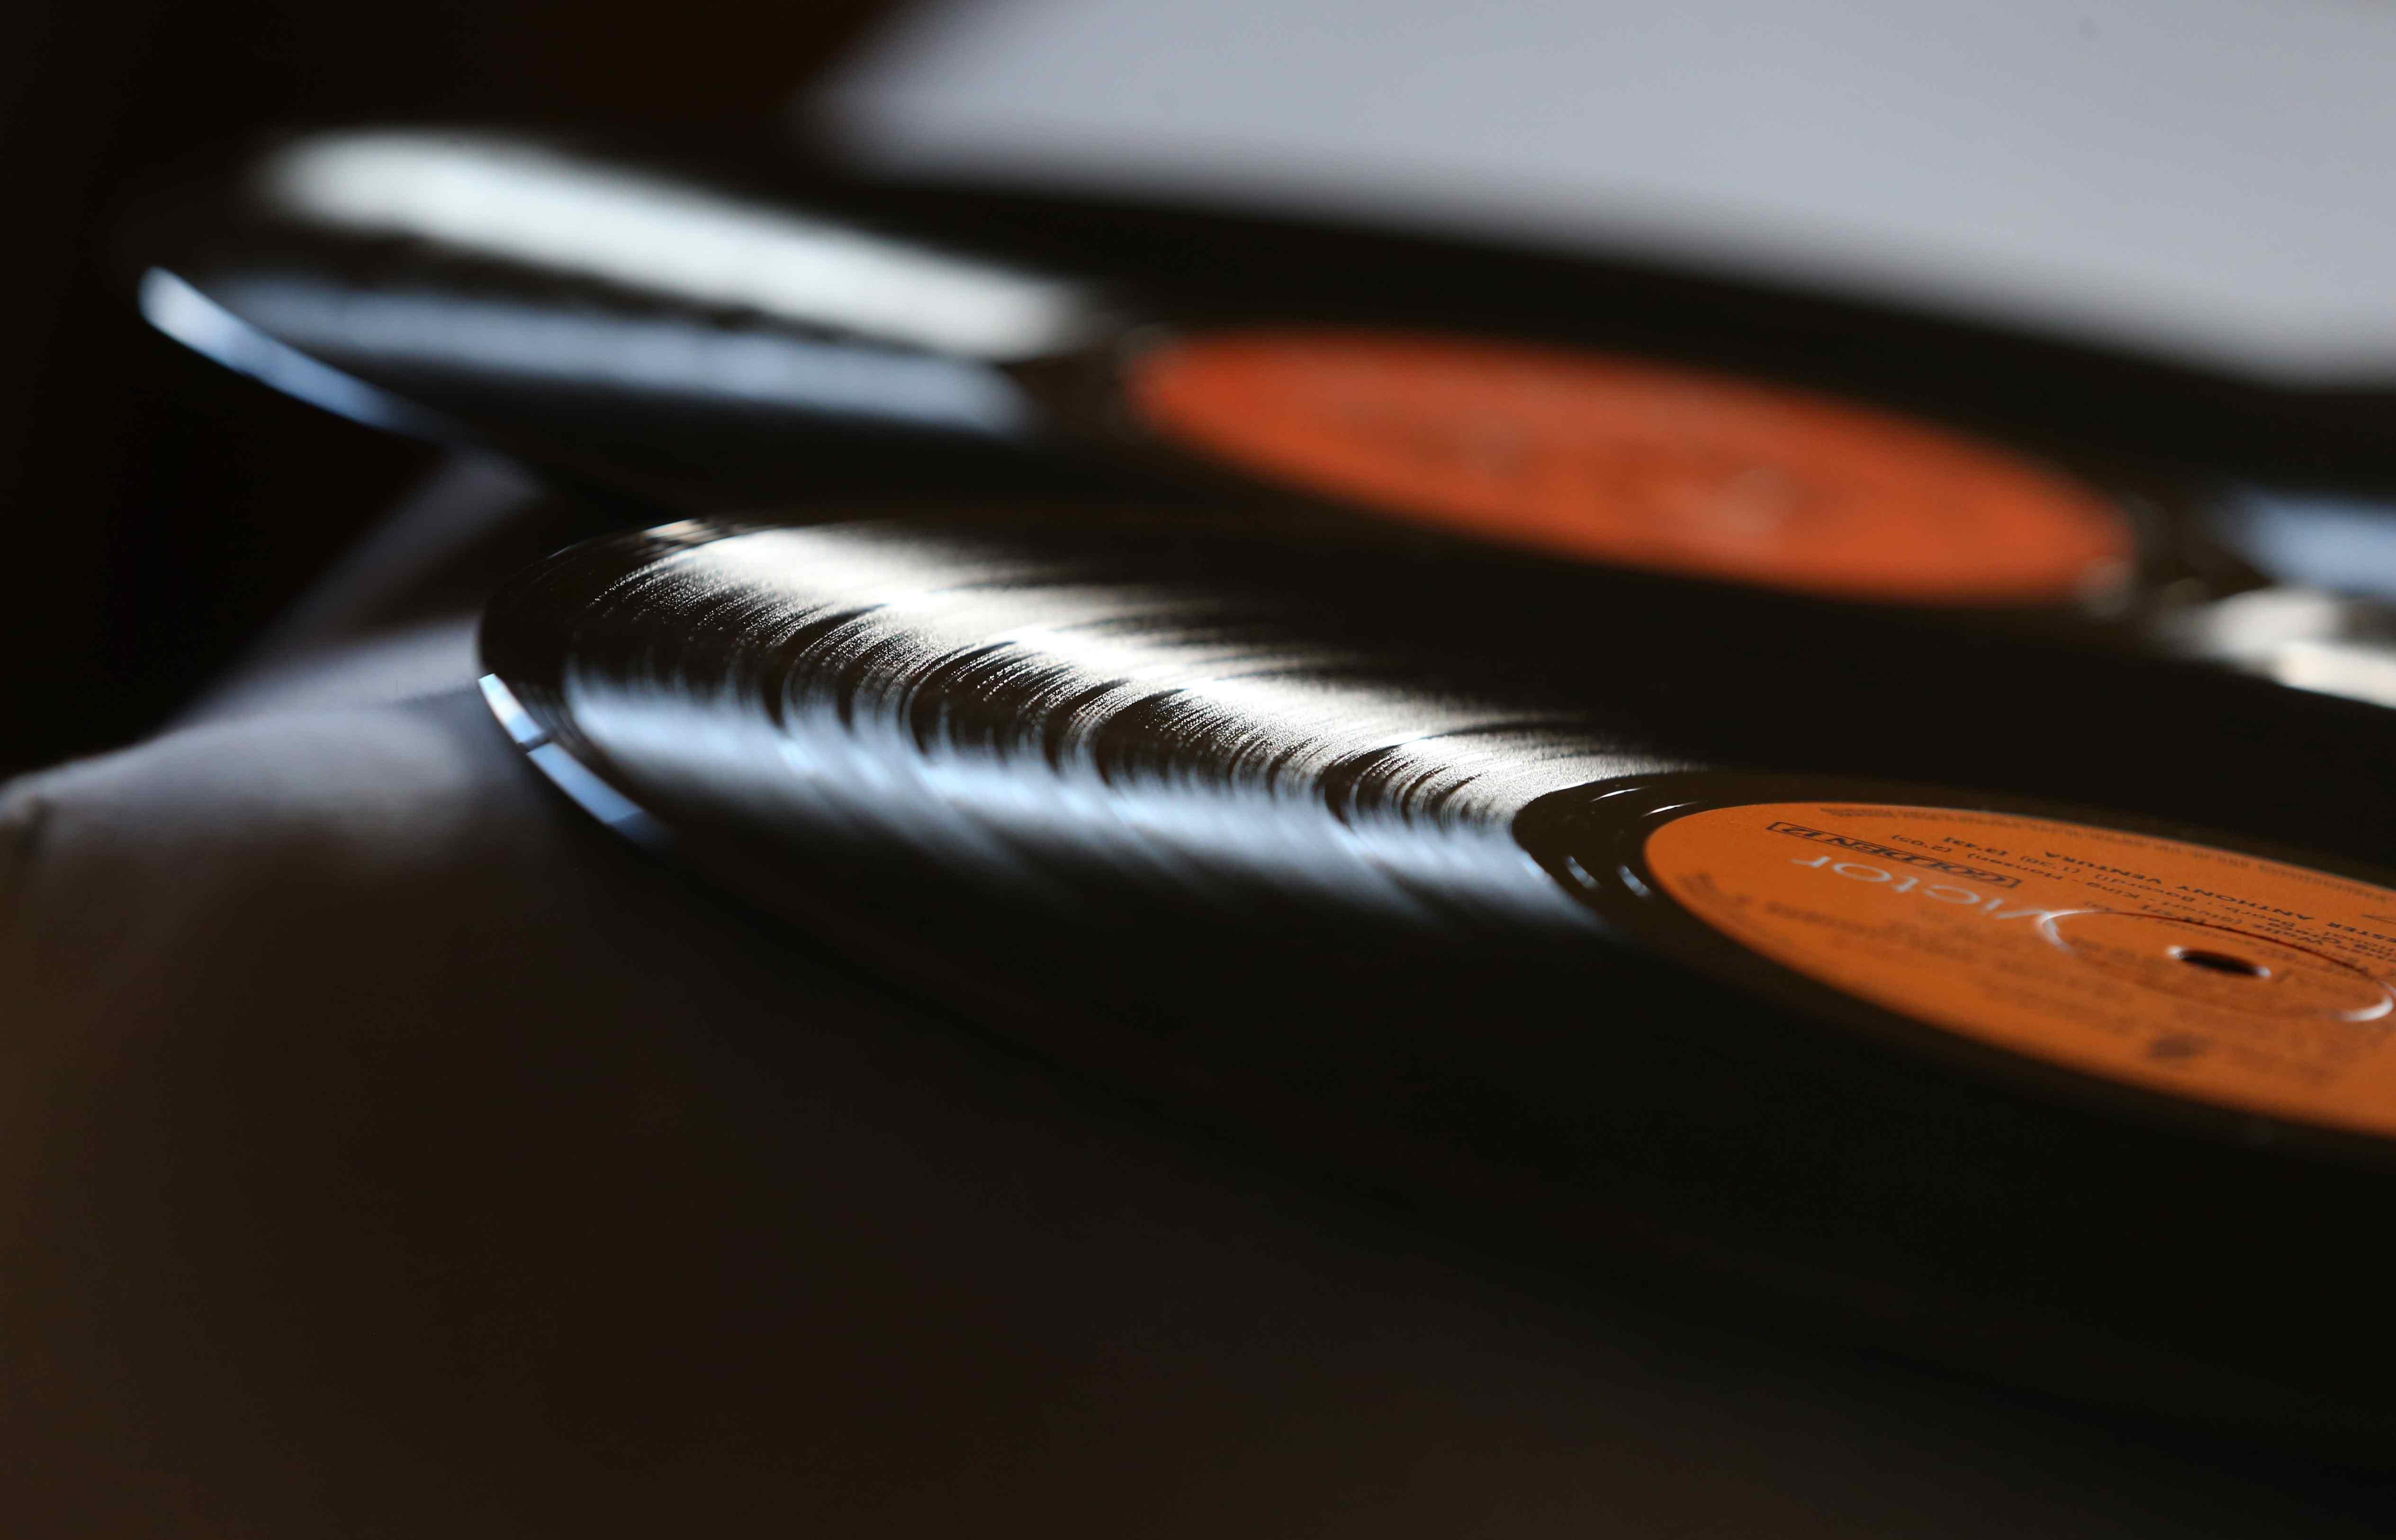 Discogs ist längst zum Vinyl-Mekka geworden